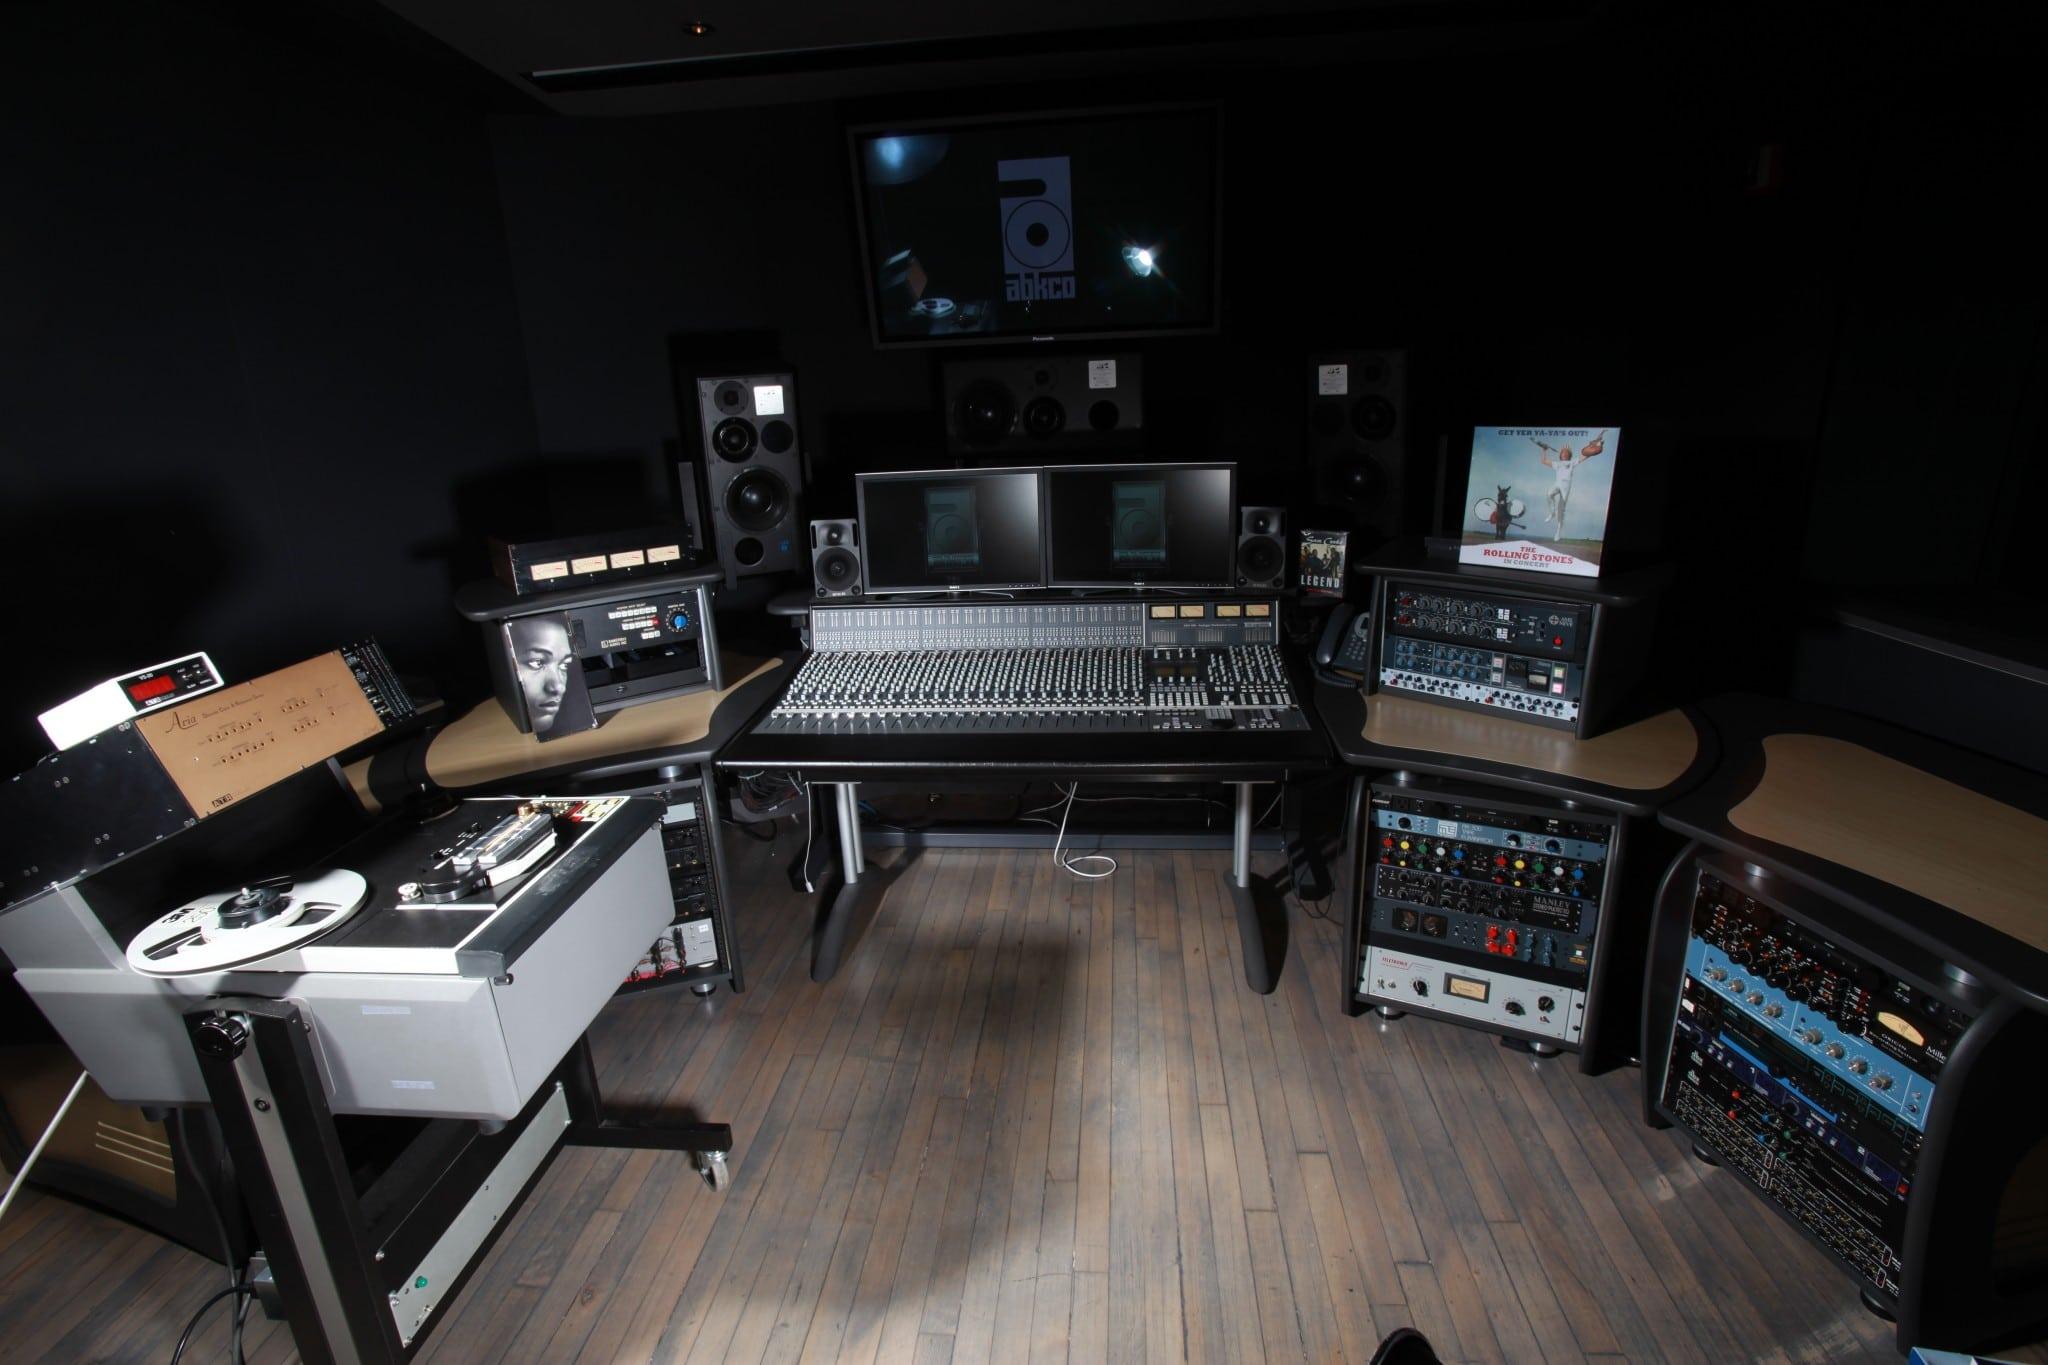 abkco-studio-wide-shot-2